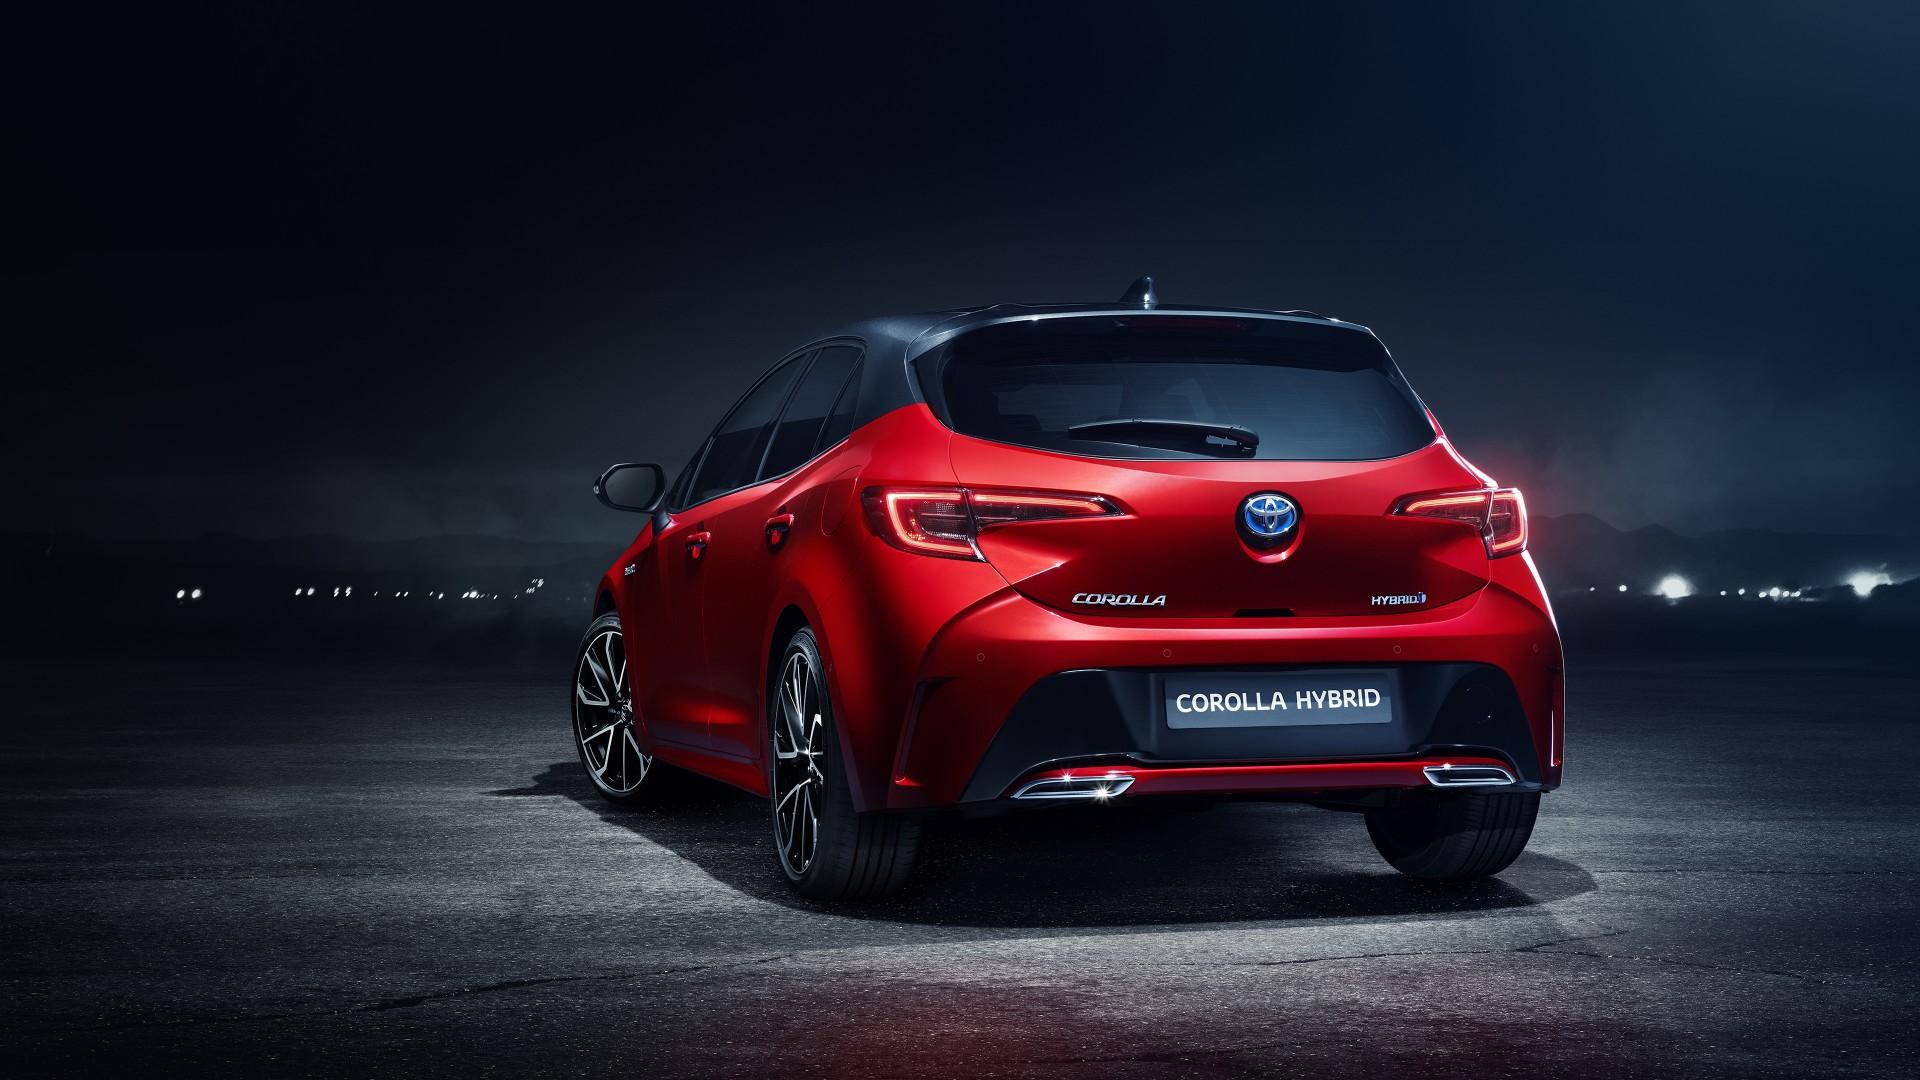 2018 Toyota Corolla Hybrid 4K Wallpaper | HD Car ...